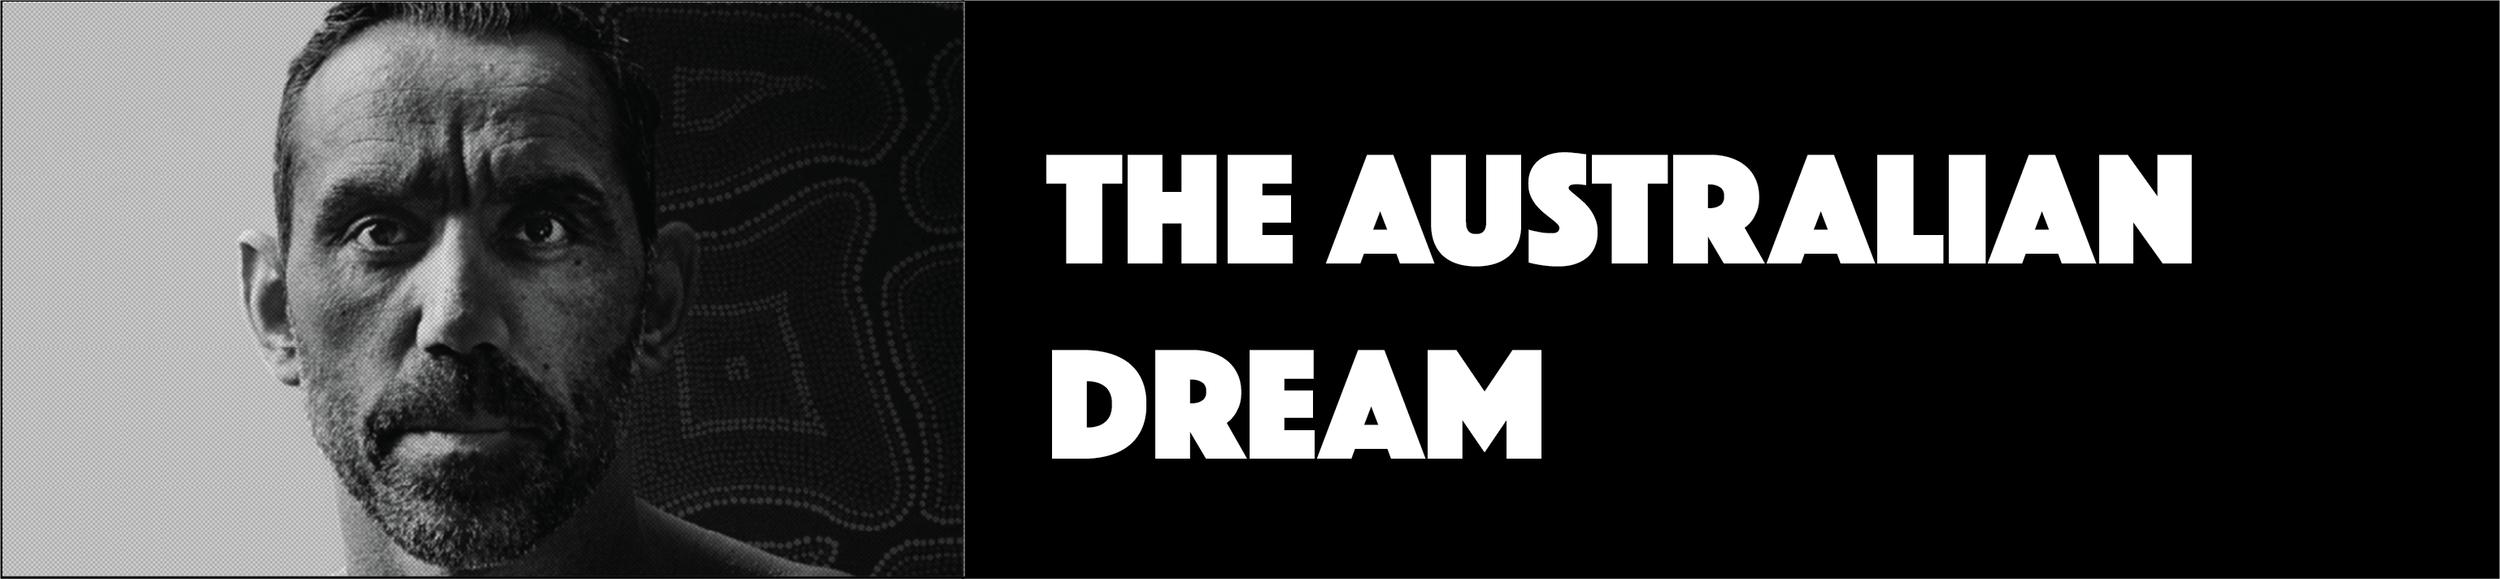 AUSTRALIAN_DREAM.png